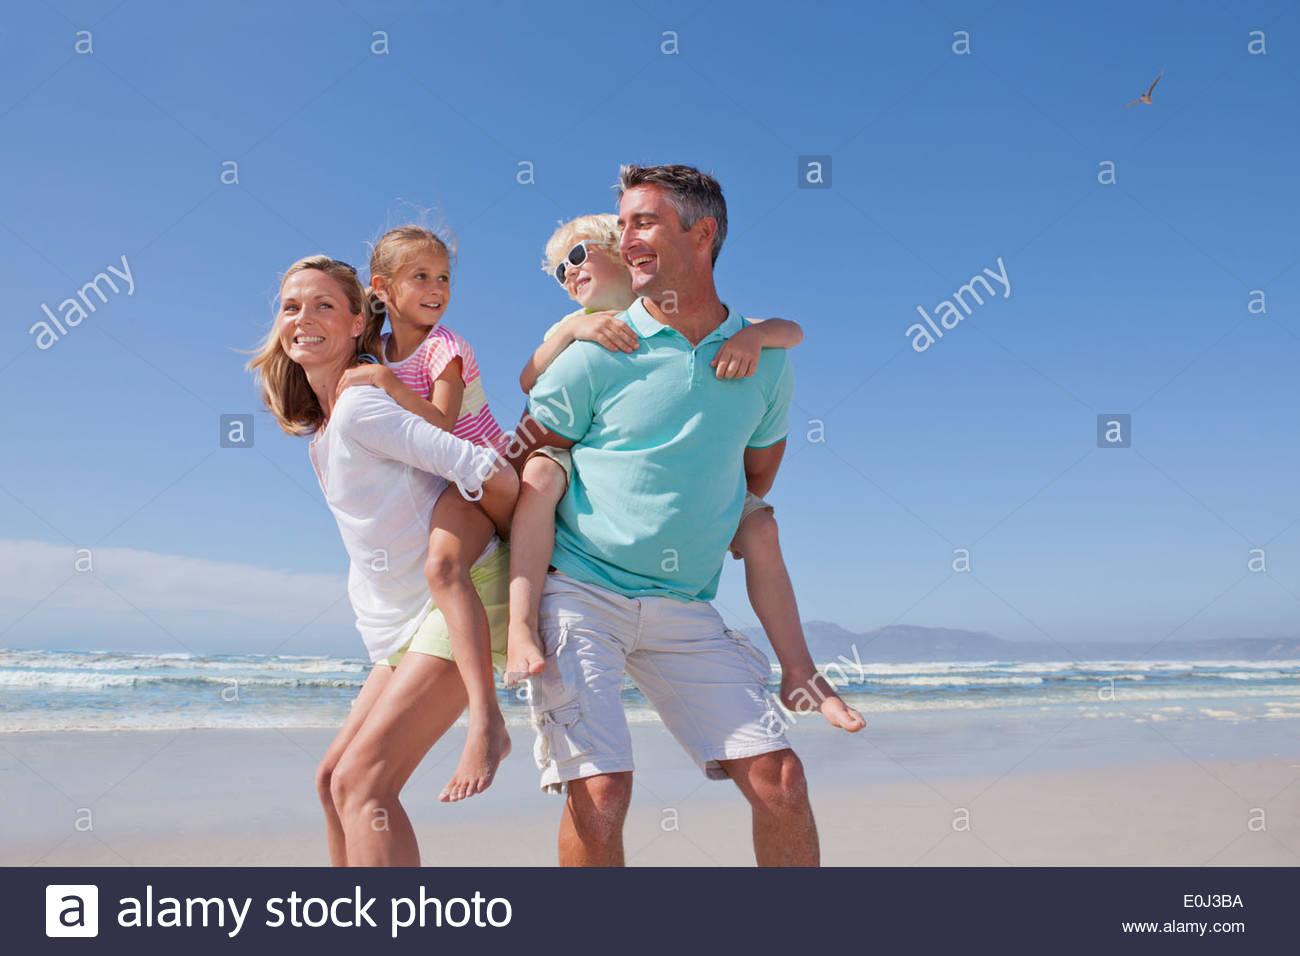 Parents piggybacking children on sunny beach - Stock Image